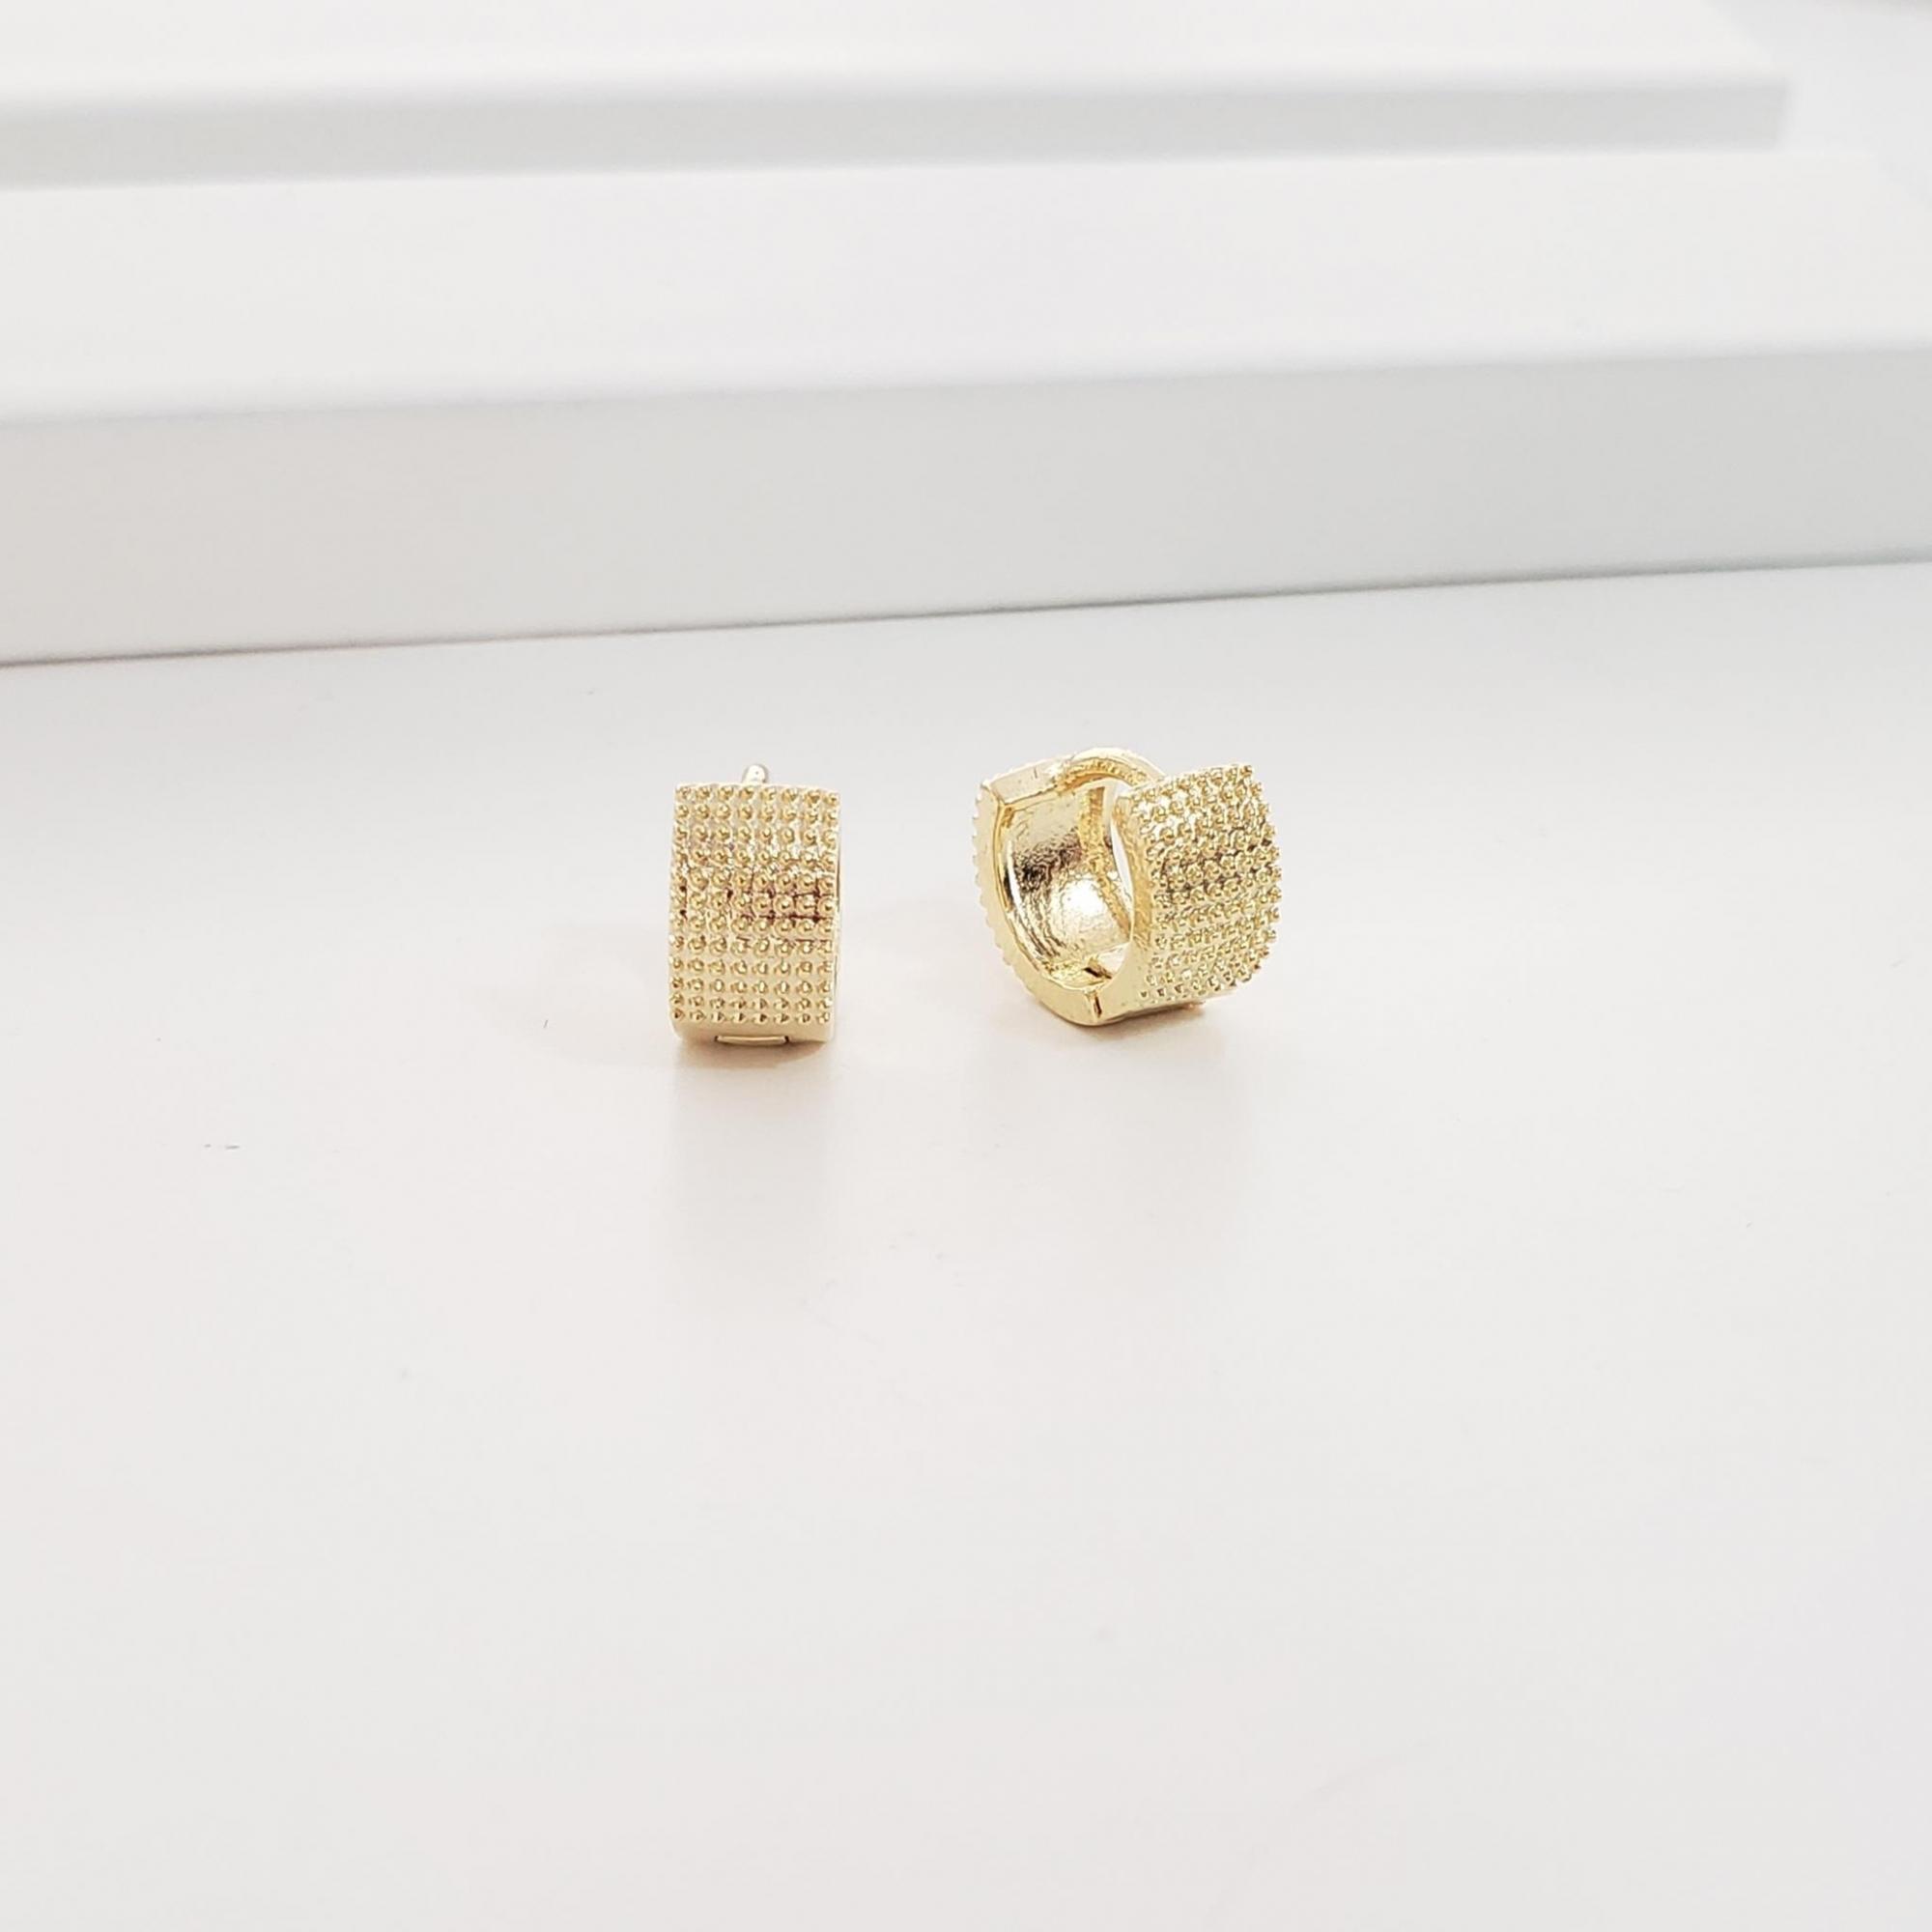 Brinco Argola 0,9cm Reta Pipoquinha no Banho Ouro 18k Semijoia